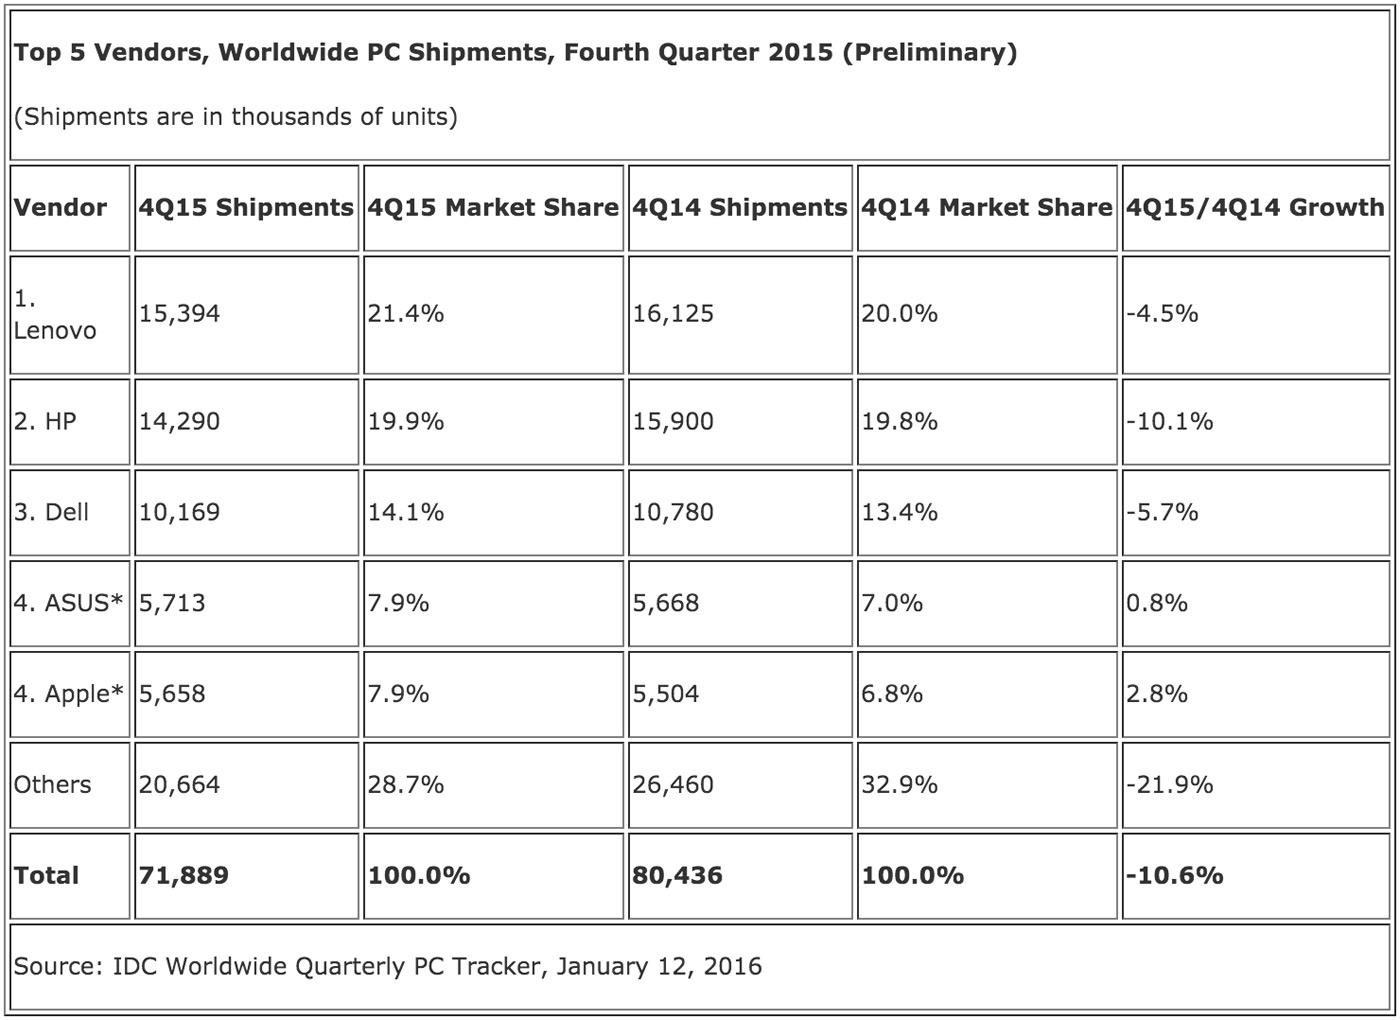 IDC's worldwide PC shipment estimate for Q4 2015